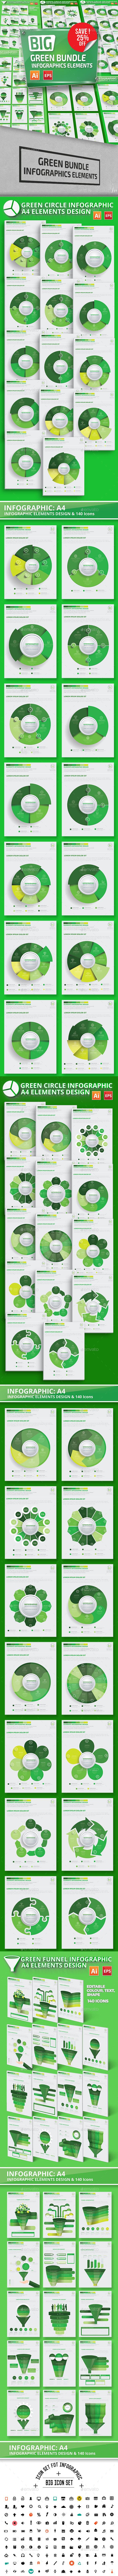 Bundle Green Infographic Elements